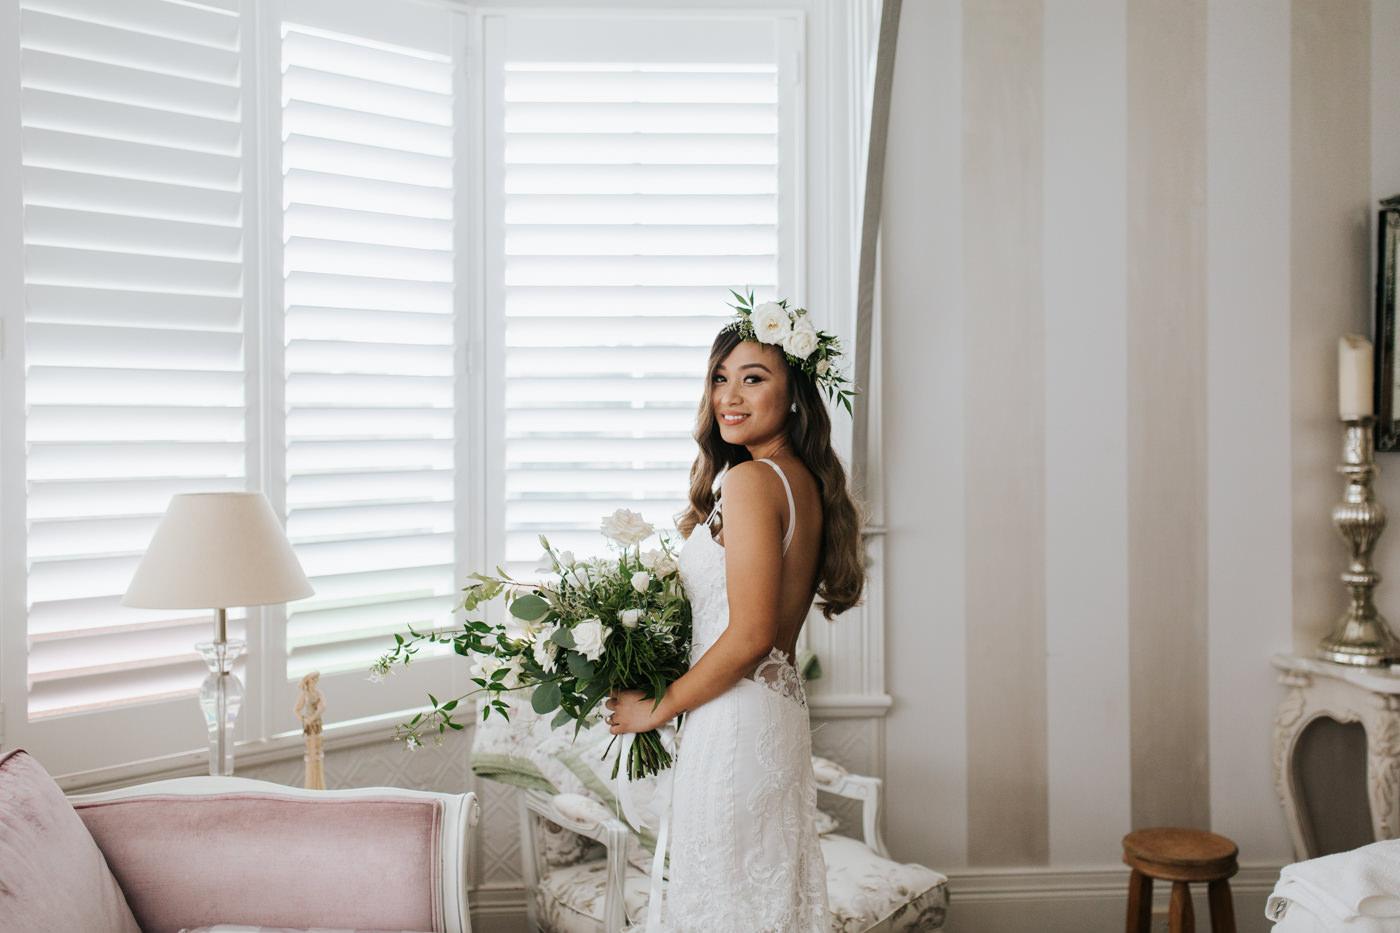 Nick & Vanezza - Fernbank Farm Wedding - Samantha Heather Photography-34.jpg